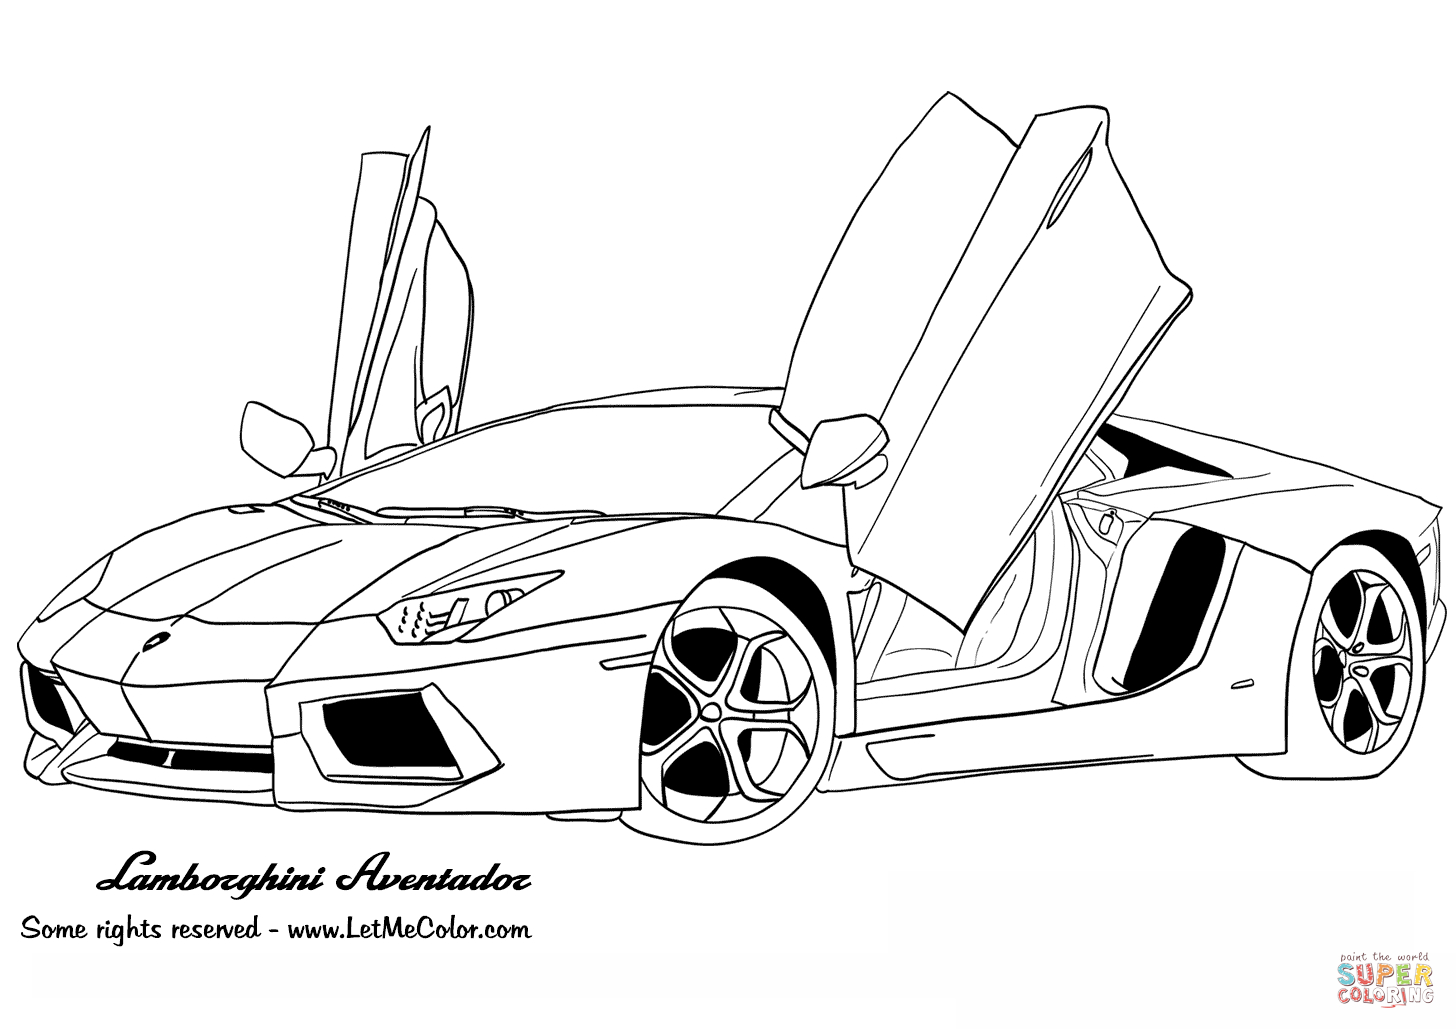 Ausmalbilder Lamborghini Gallardo (Mit Bildern) | Malvorlage innen Malvorlagen Lamborghini